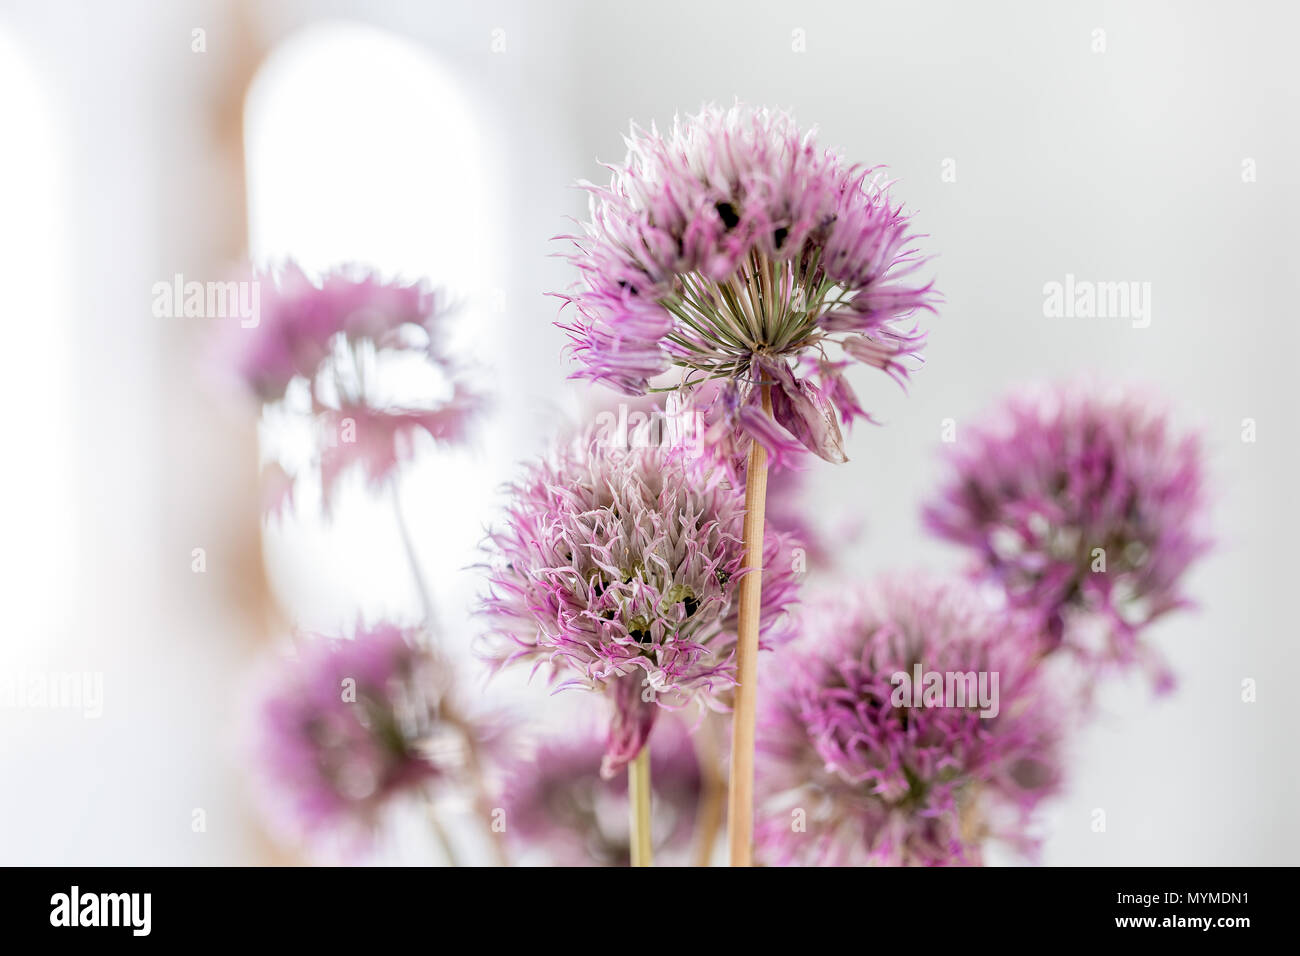 Flores unisexual flower